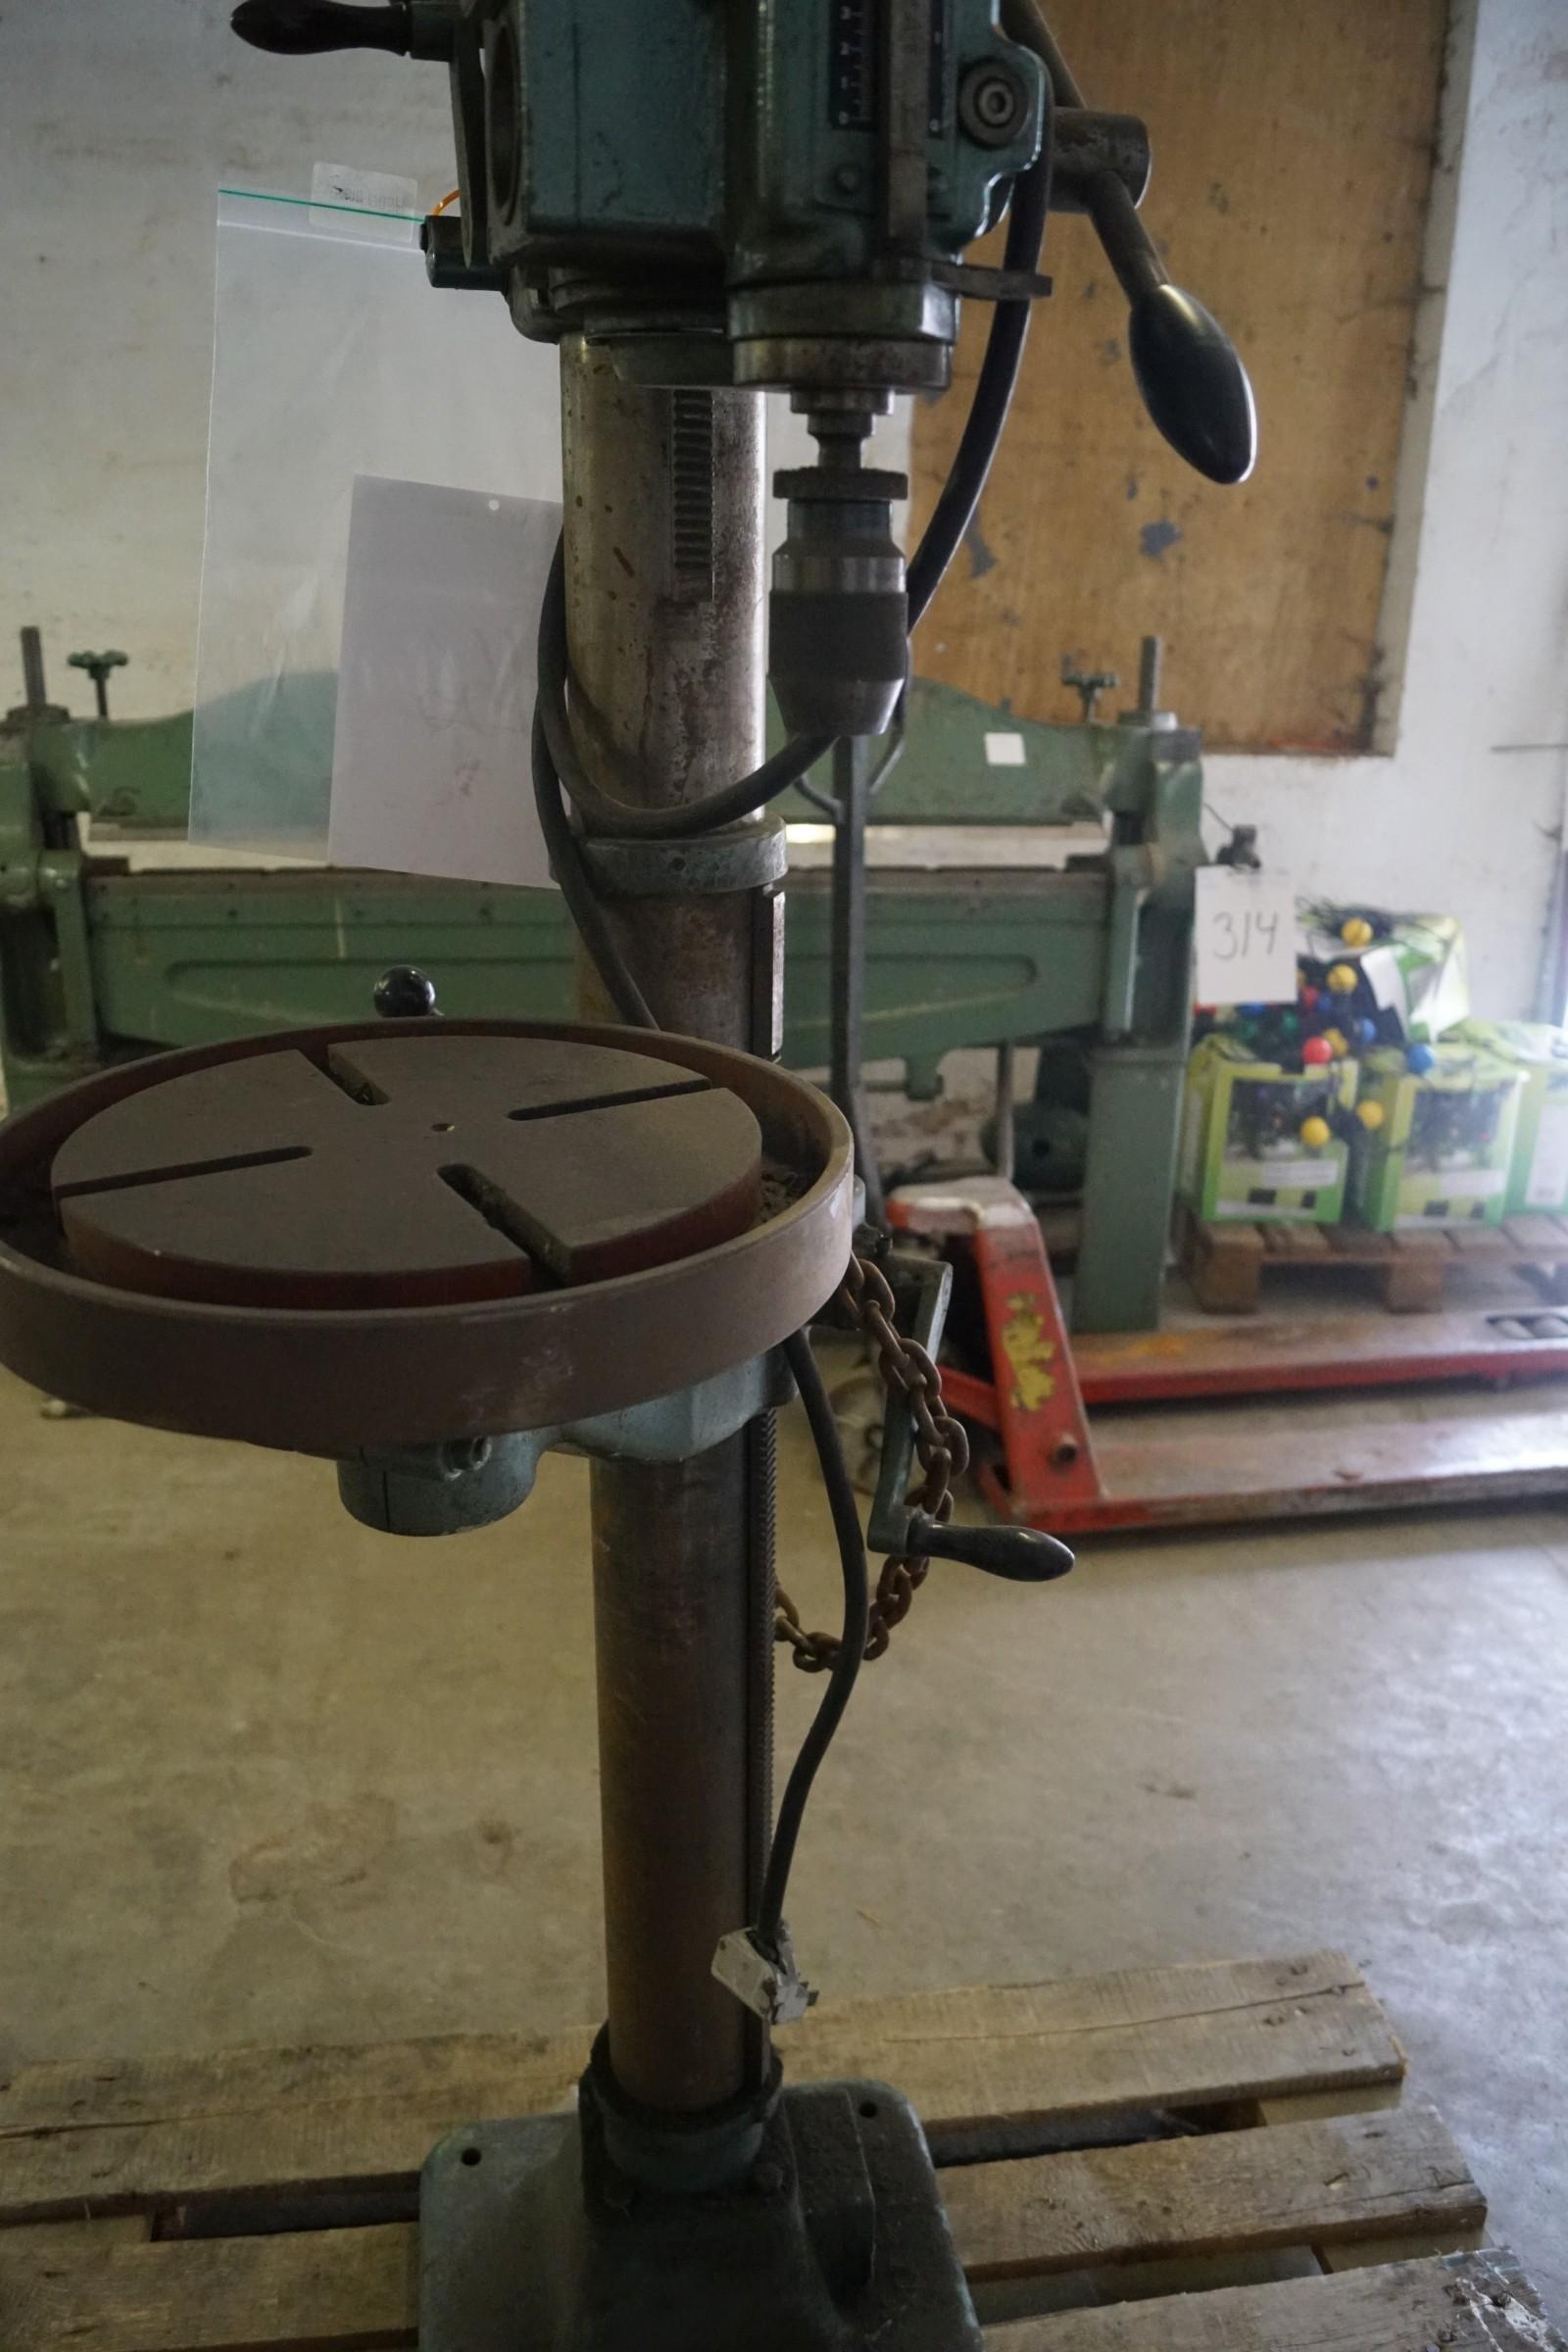 Søjleboremaskine Arboga maskiner - KJ Auktion - Maskinauktioner